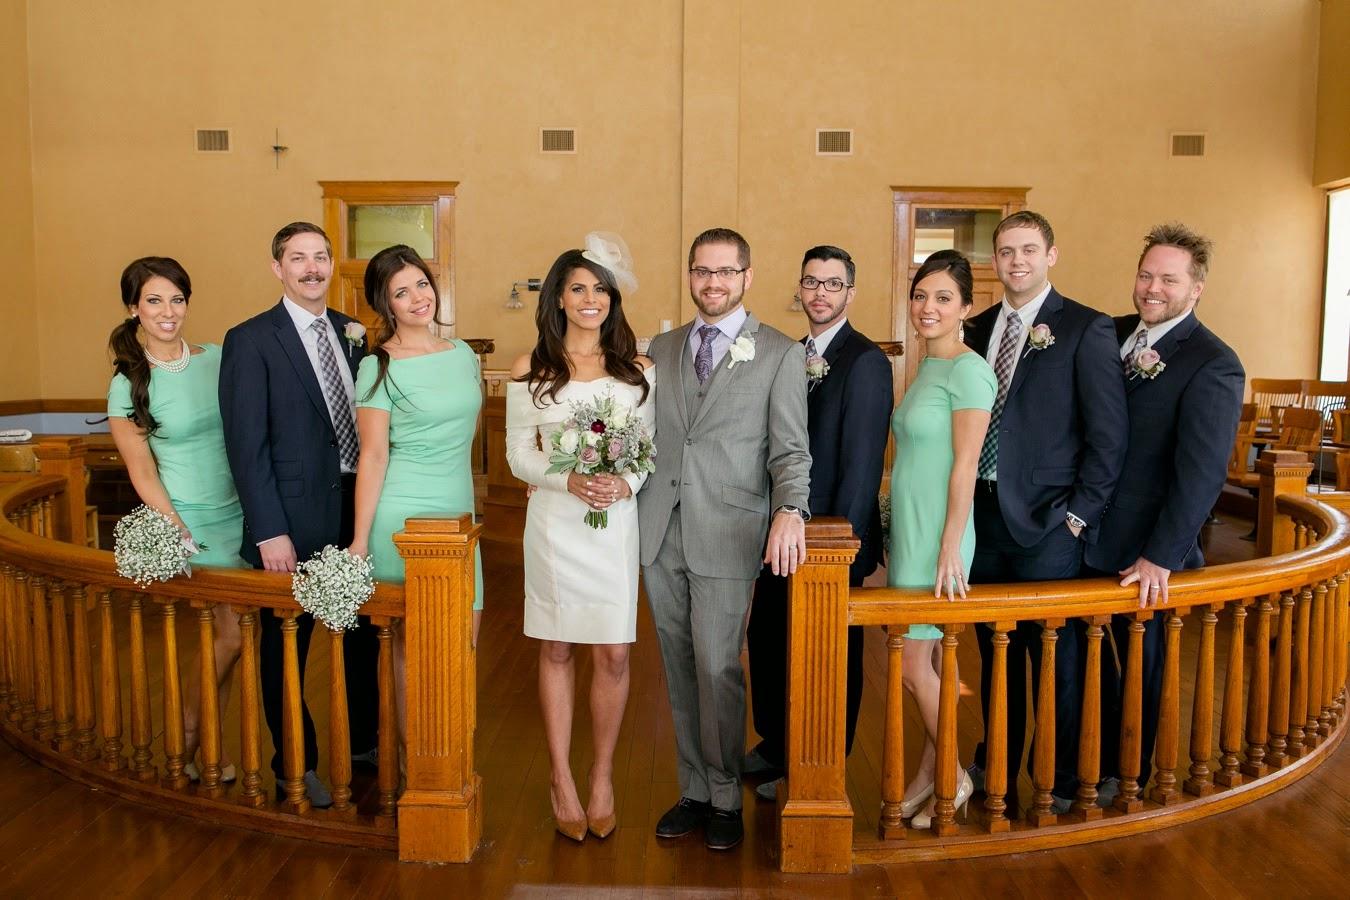 Rachel Amp Eric S Georgetown Courthouse Wedding Amp Lambert S